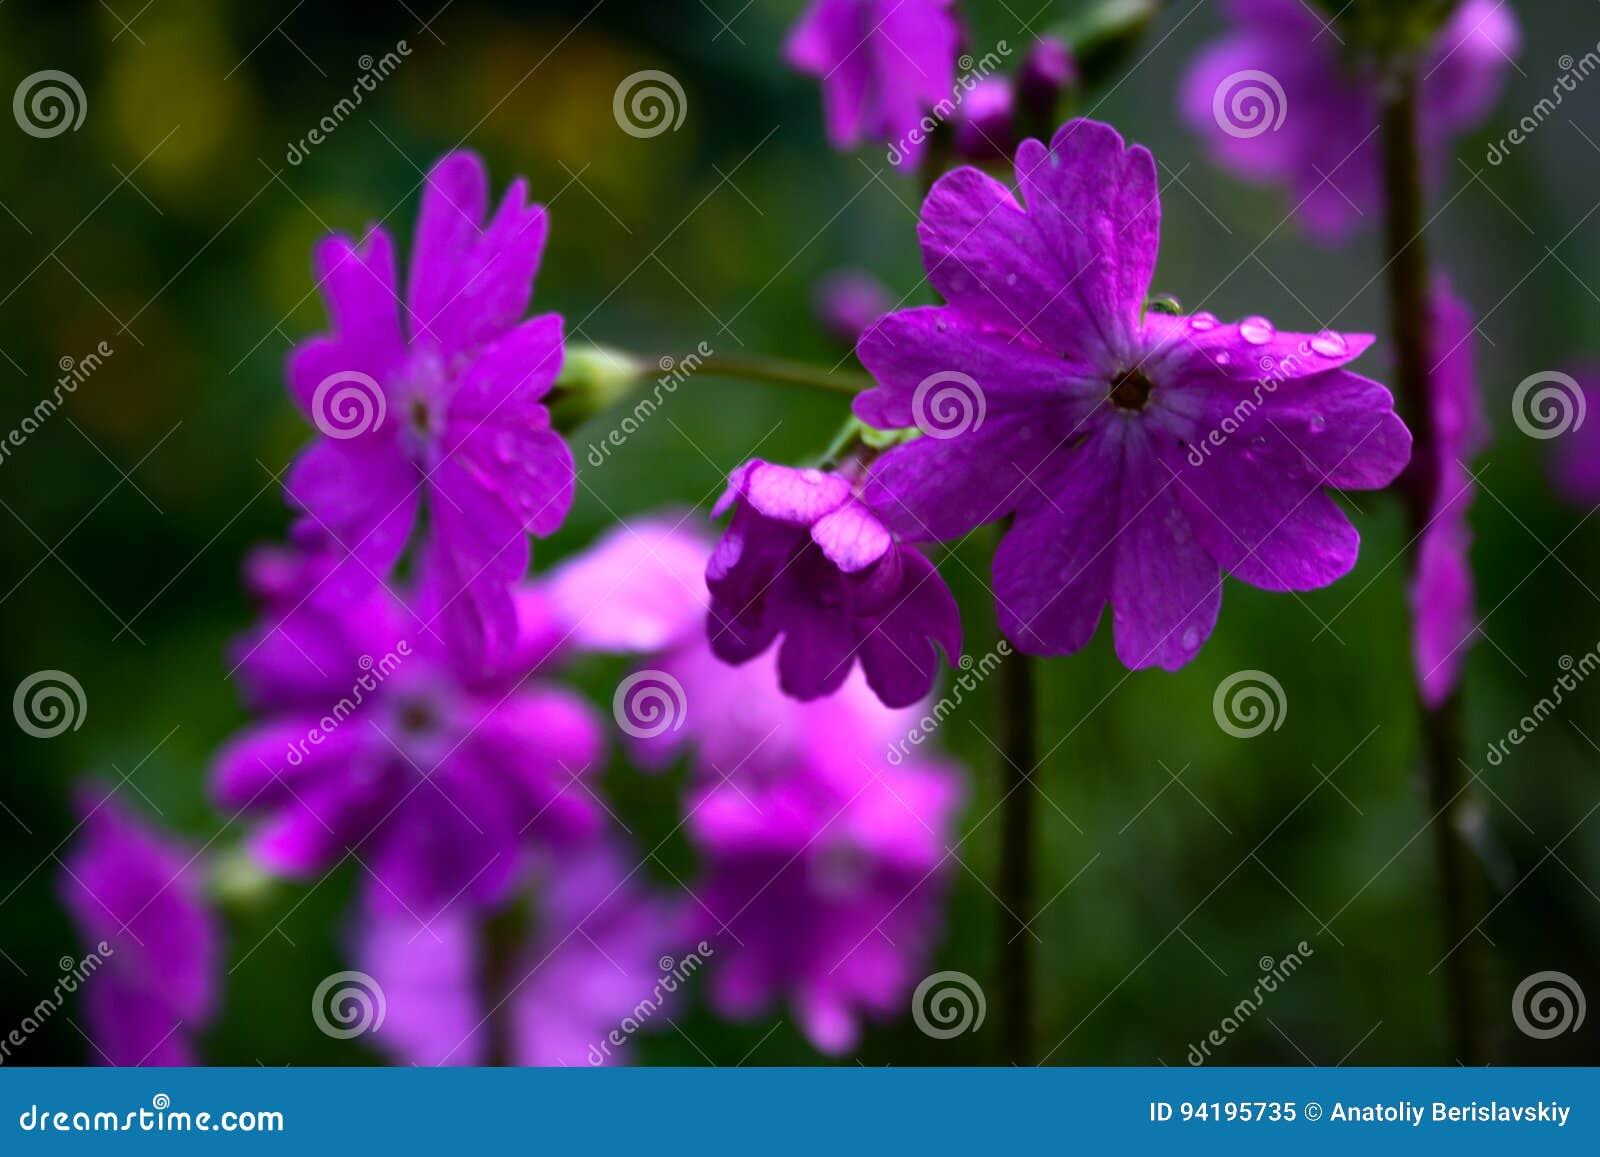 Beautiful flowers wallpaper background stock image image of beautiful flowers wallpaper background izmirmasajfo